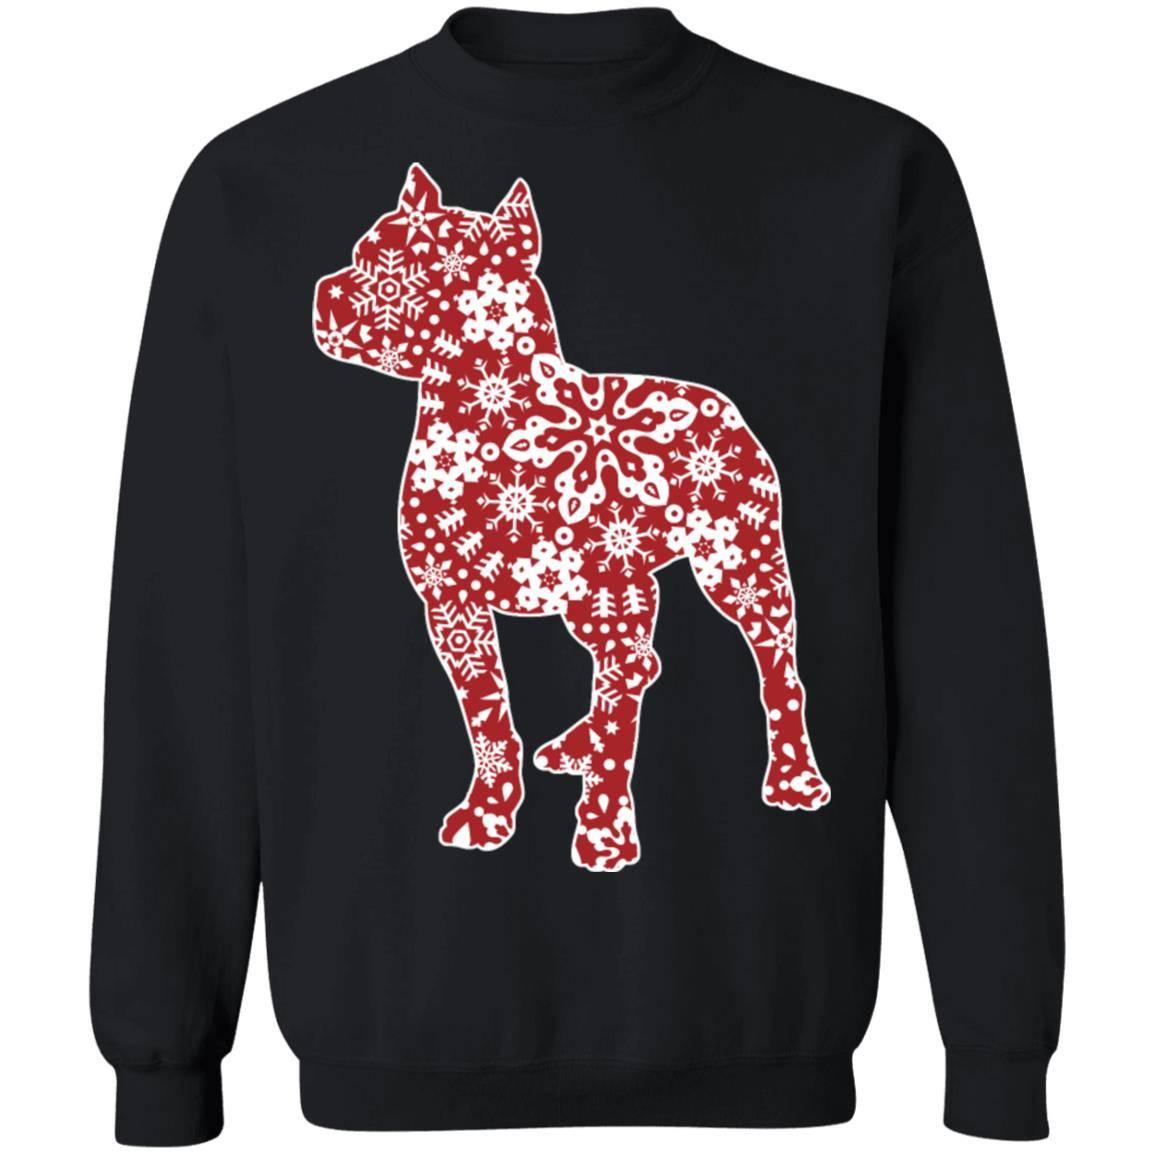 217 – Pitbull Christmas Snowflakes T shirt G180 Gildan Crewneck Pullover Sweatshirt  8 oz.